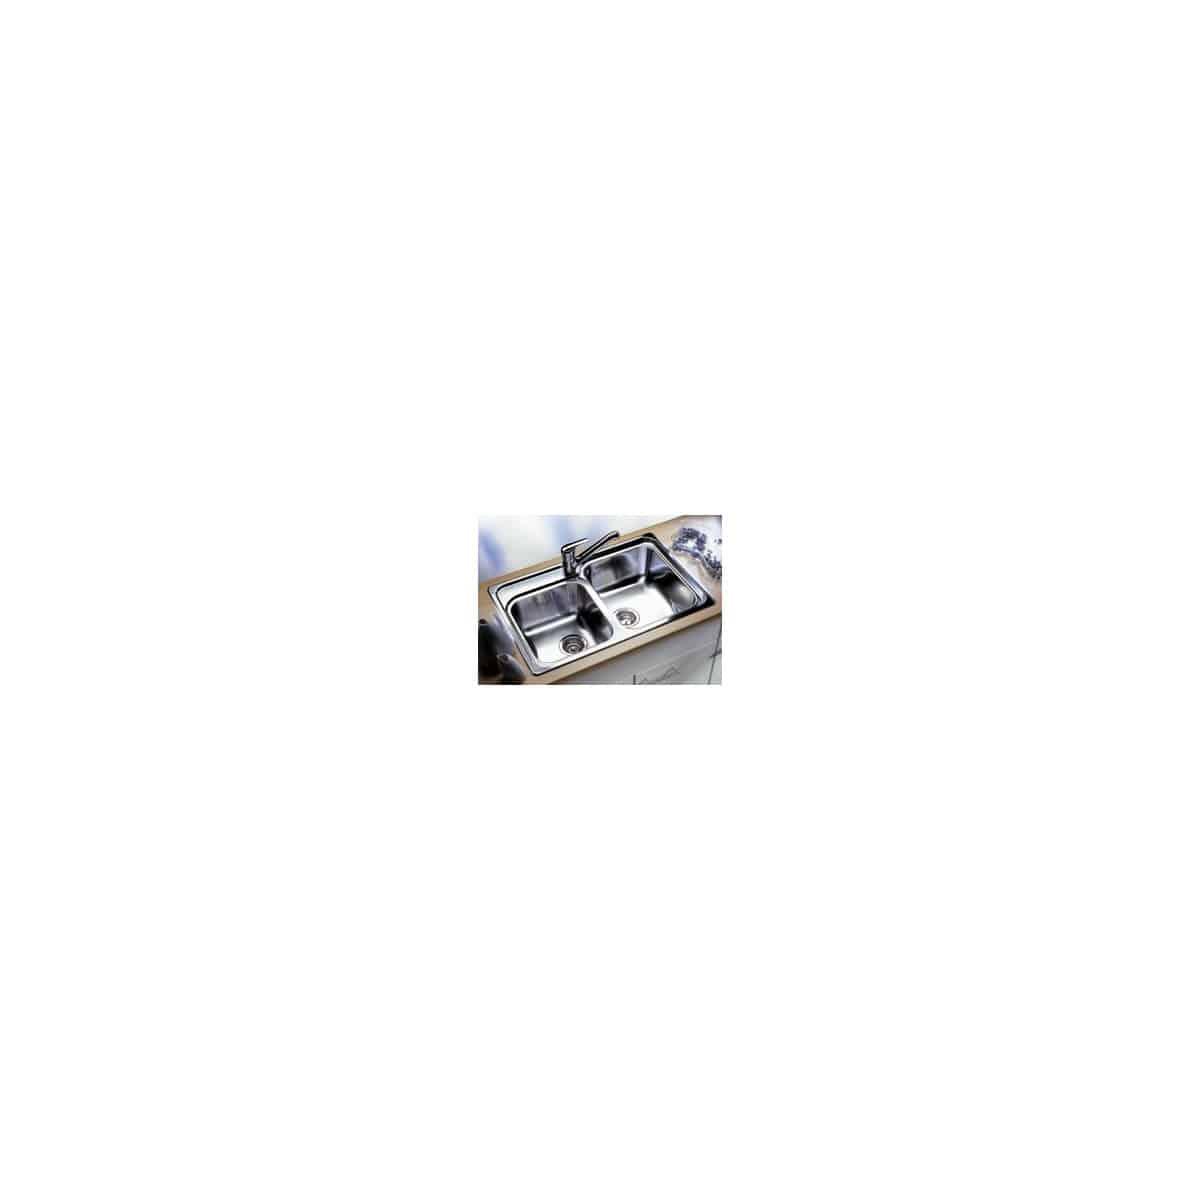 Blancoclassic 8 Inox -